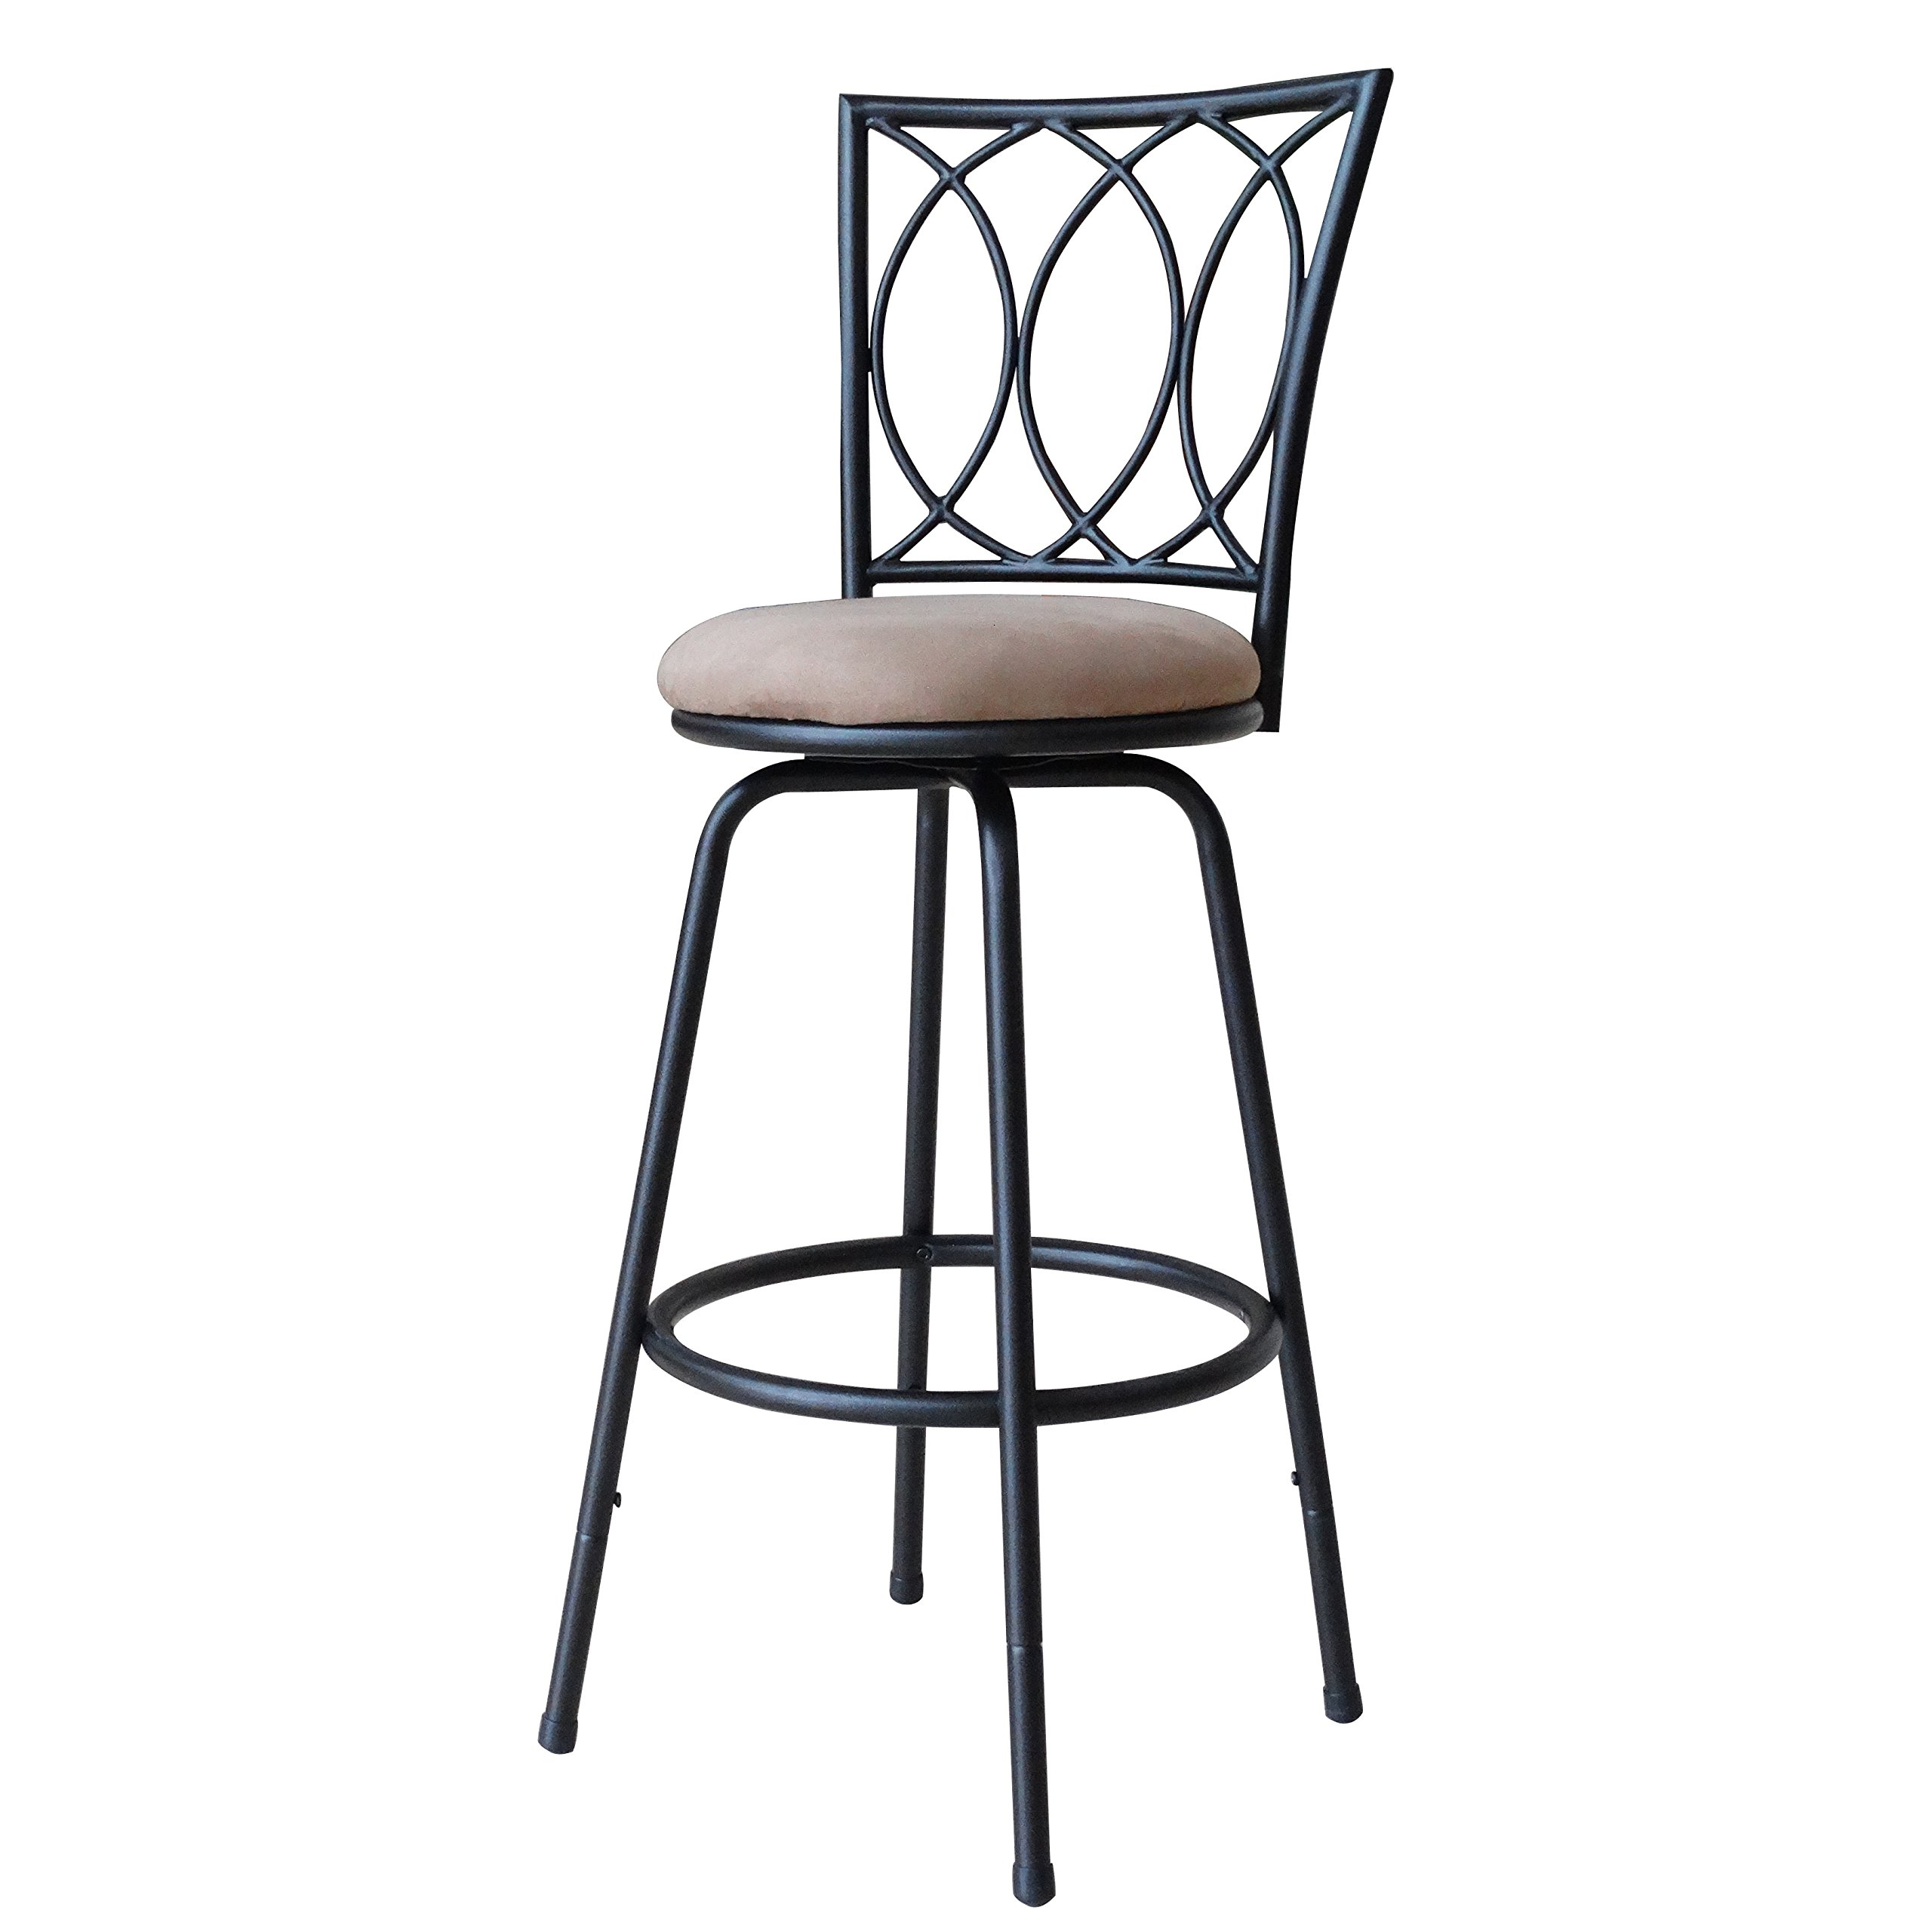 Roundhill Furniture Redico Adjustable Metal Barstool, Powder Coated Black by Roundhill Furniture